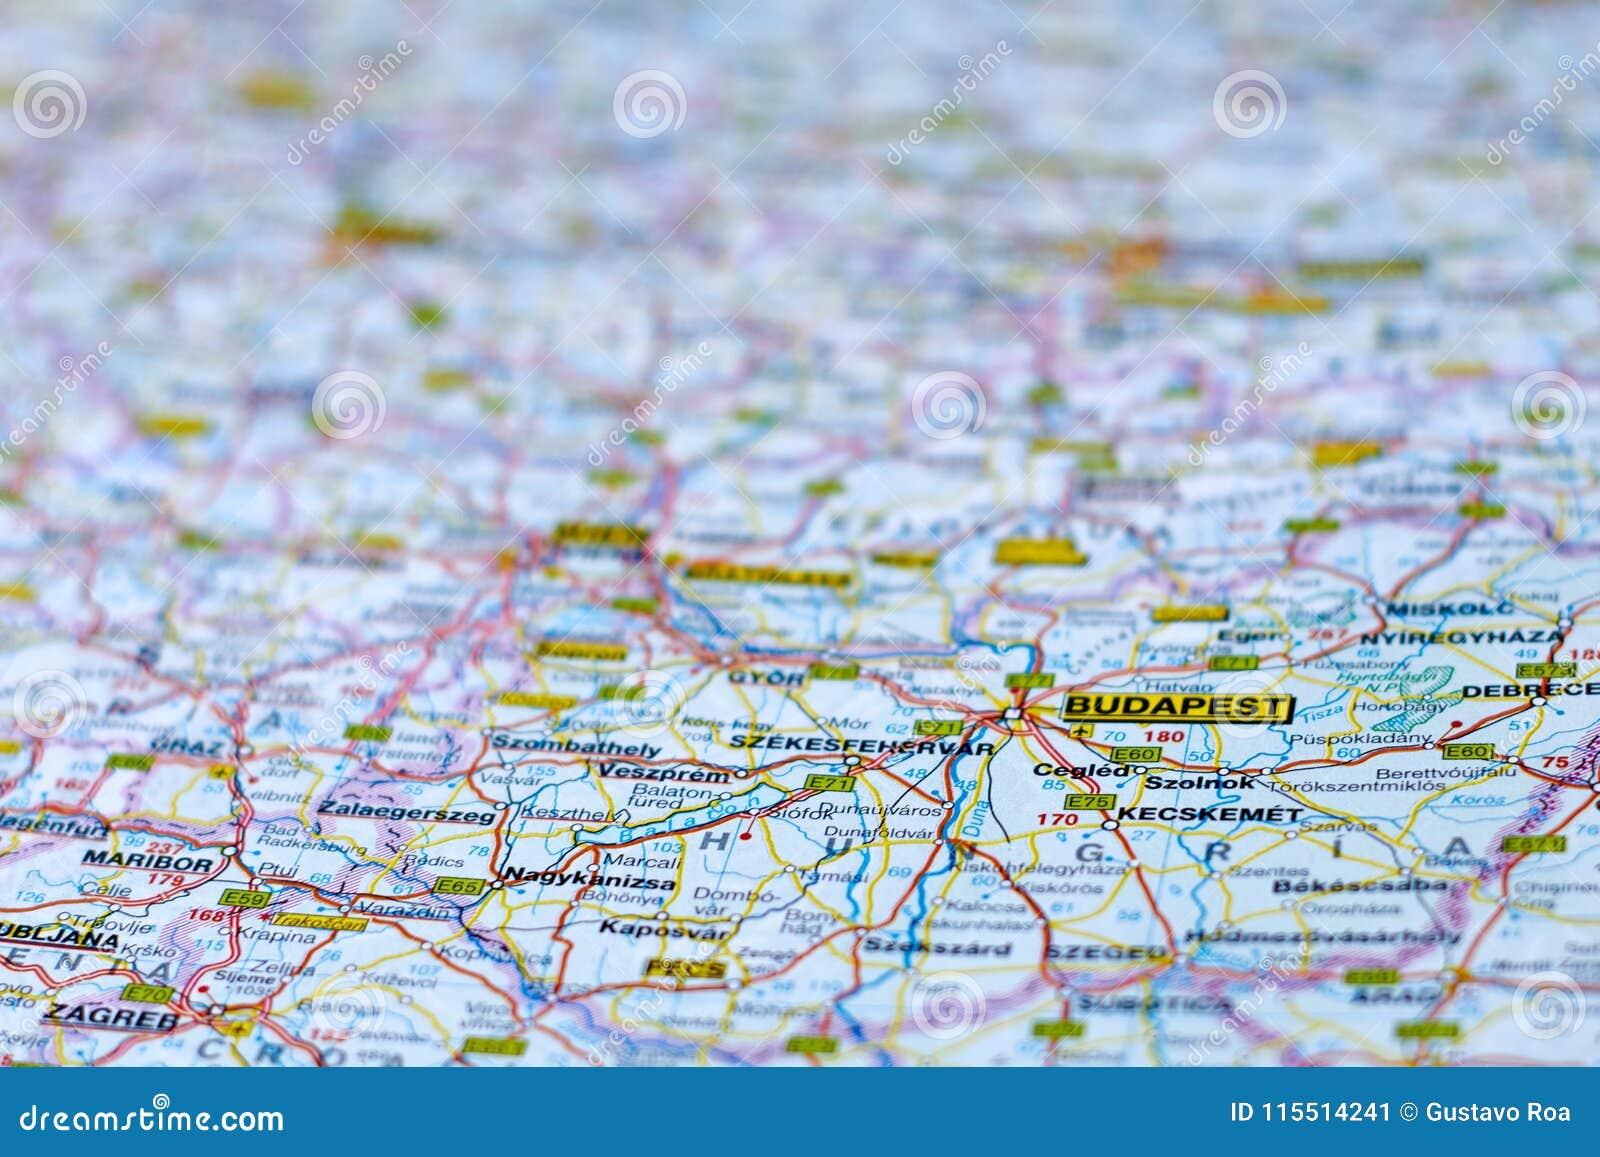 Map of Budapest, Hungary stock image. Image of travel - 115514241